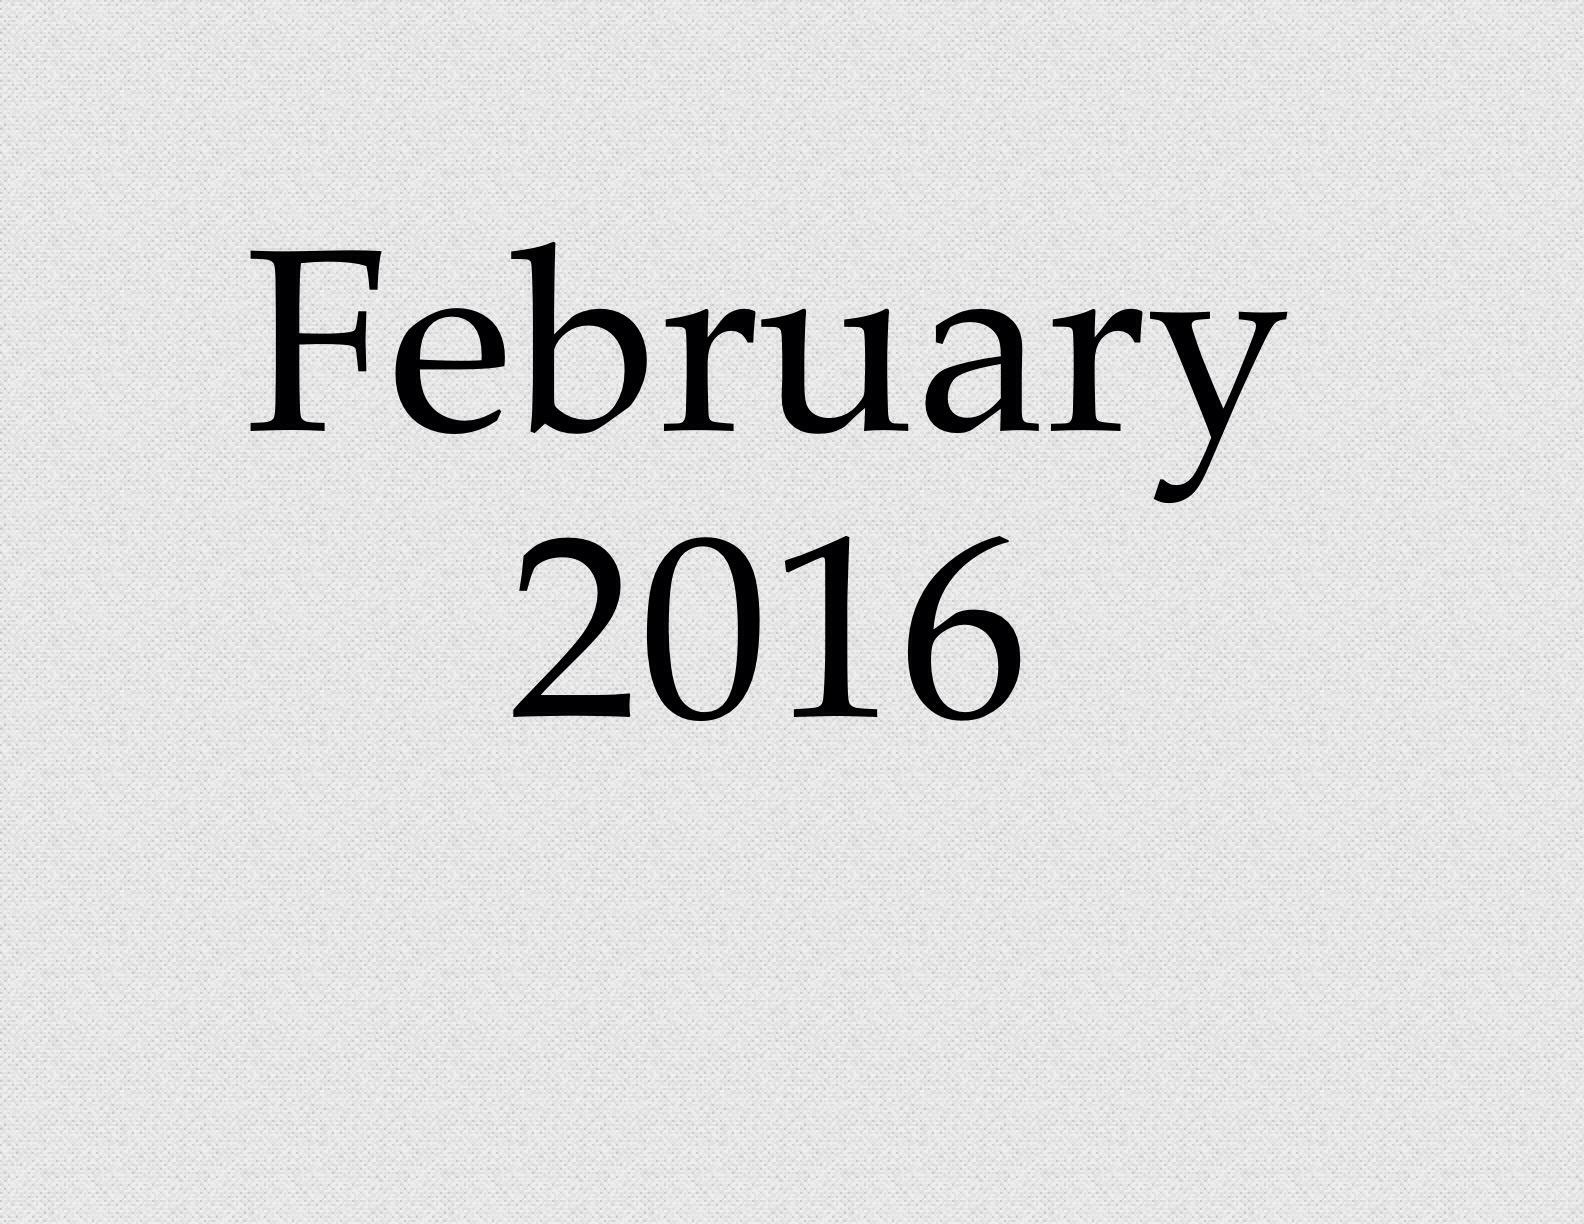 Photo Feb 02, 1 14 07 PM.jpg